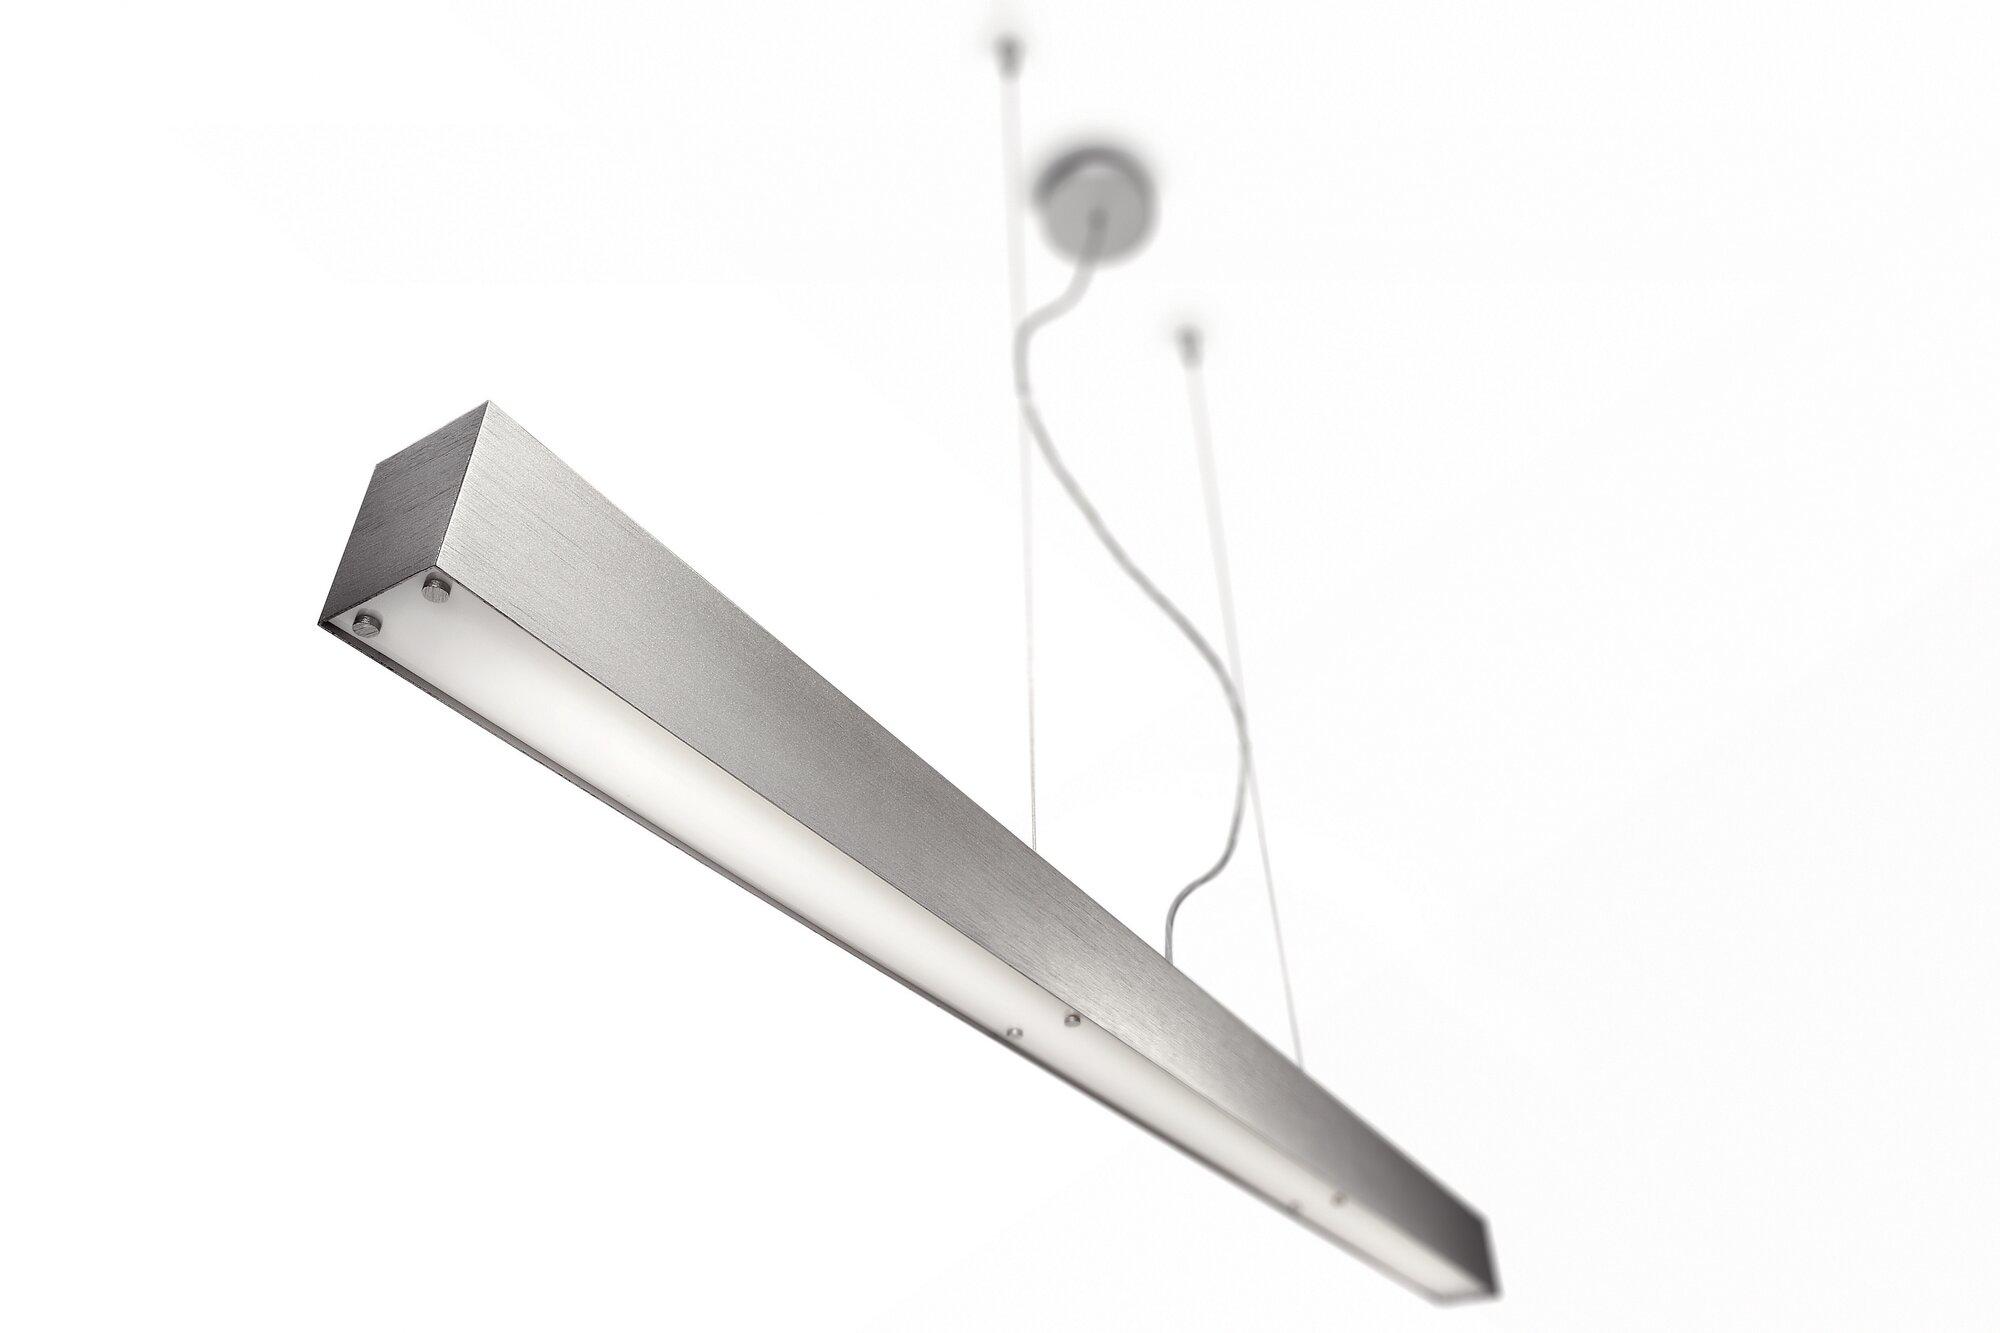 philips consumer luminaire axis 1 light kitchen island pendant. Black Bedroom Furniture Sets. Home Design Ideas